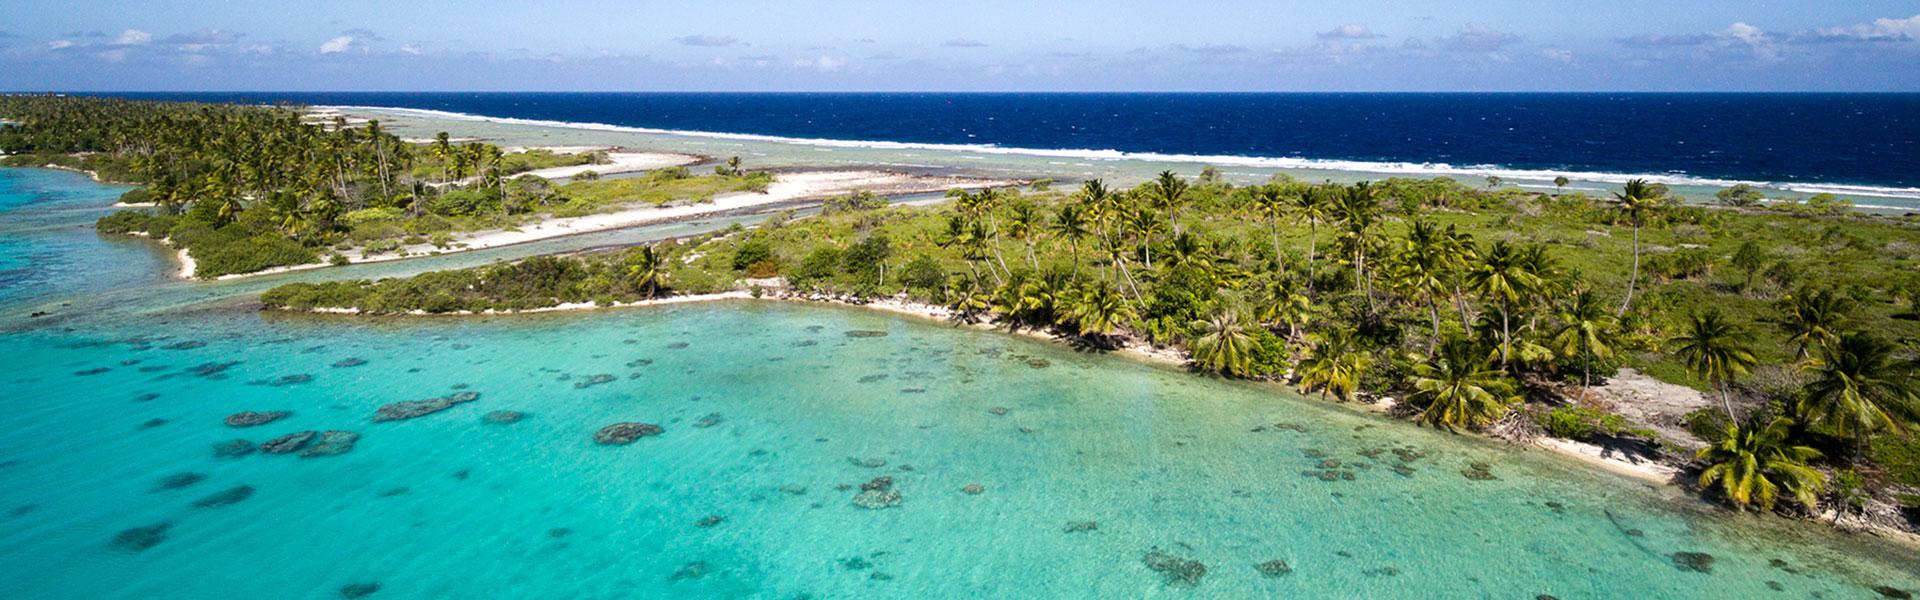 Private islands for sale motu karatae french polynesia for French polynesia islands for sale